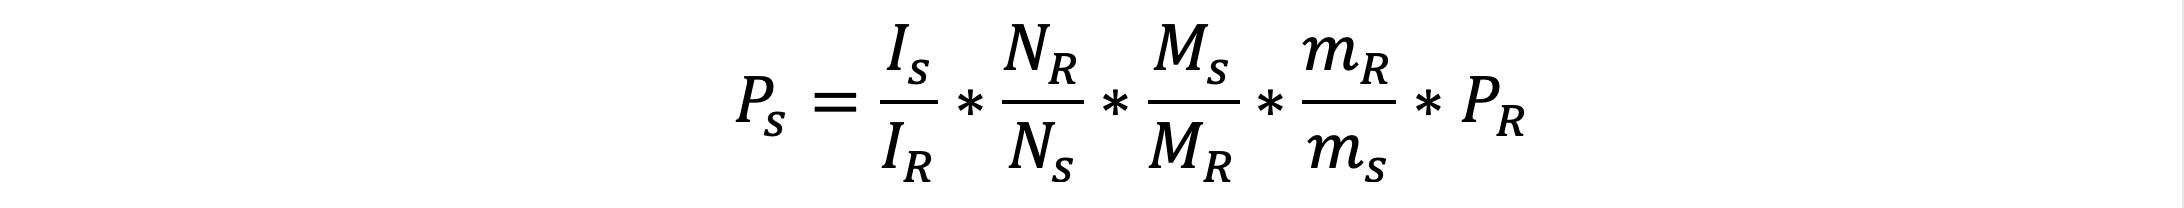 Nanalysis-qnmr-benchtop-nmr.png